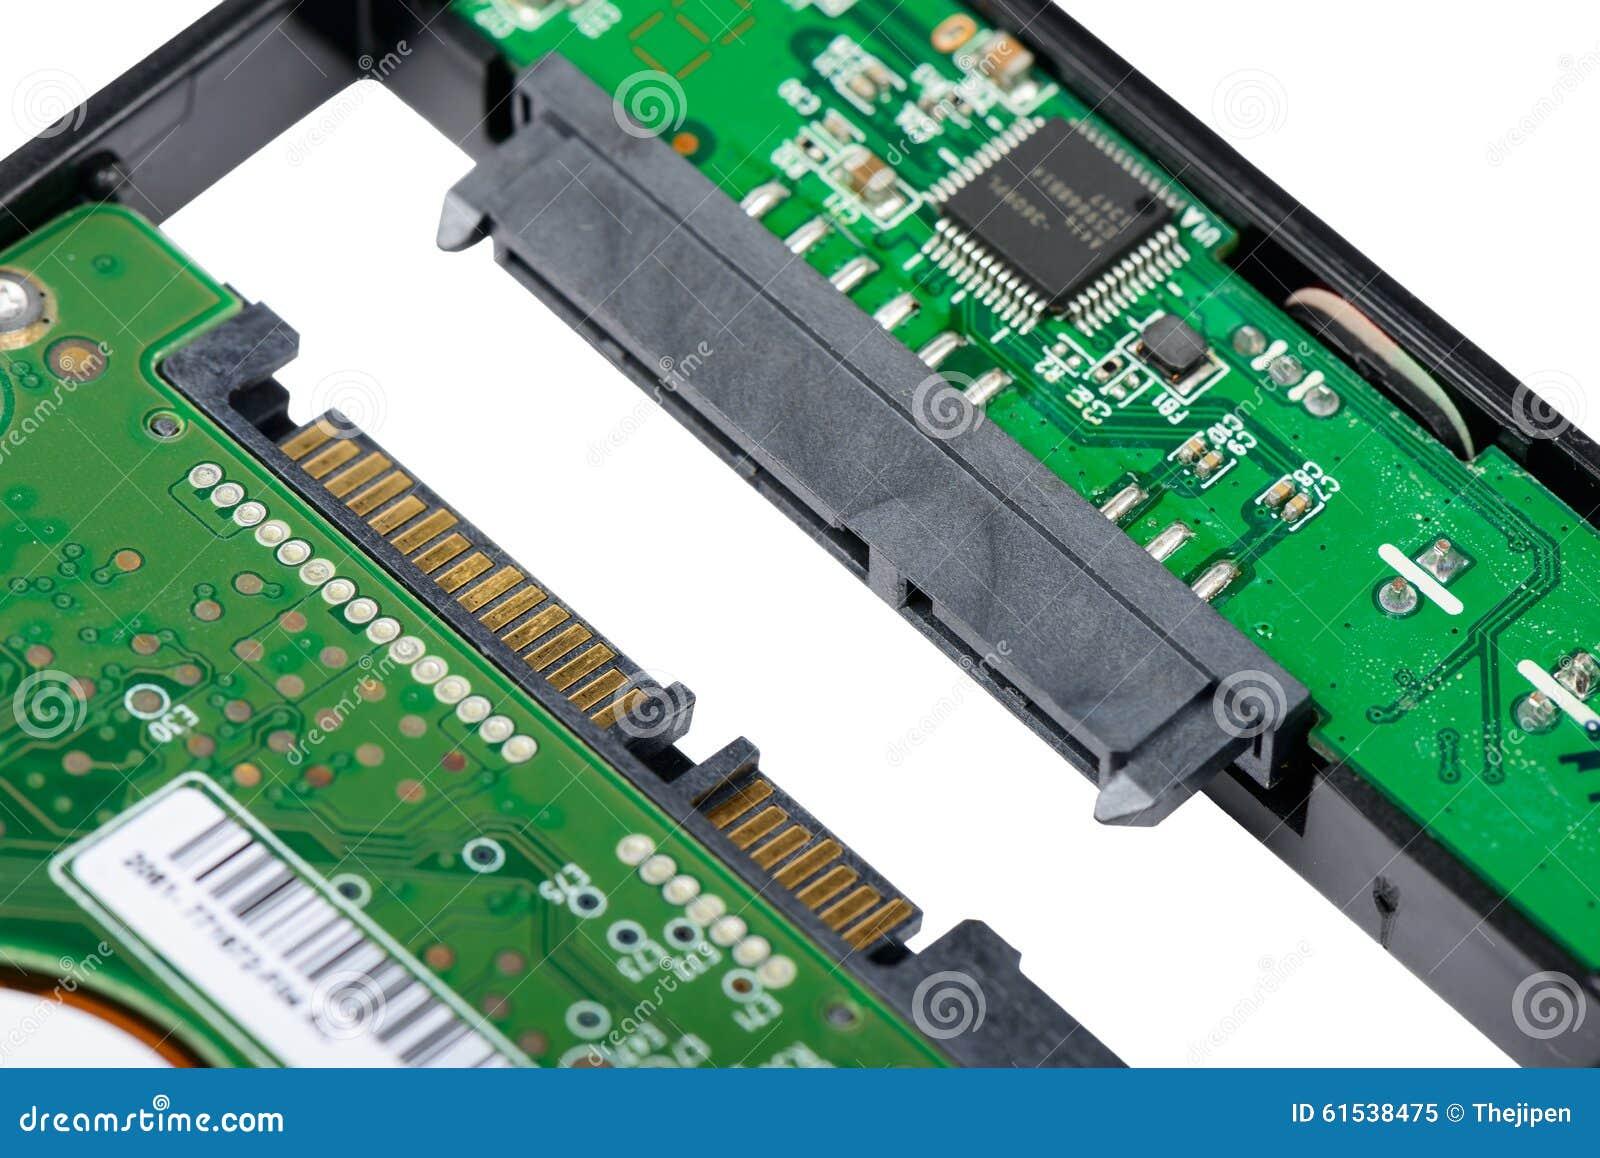 how to run photos from external hard drive